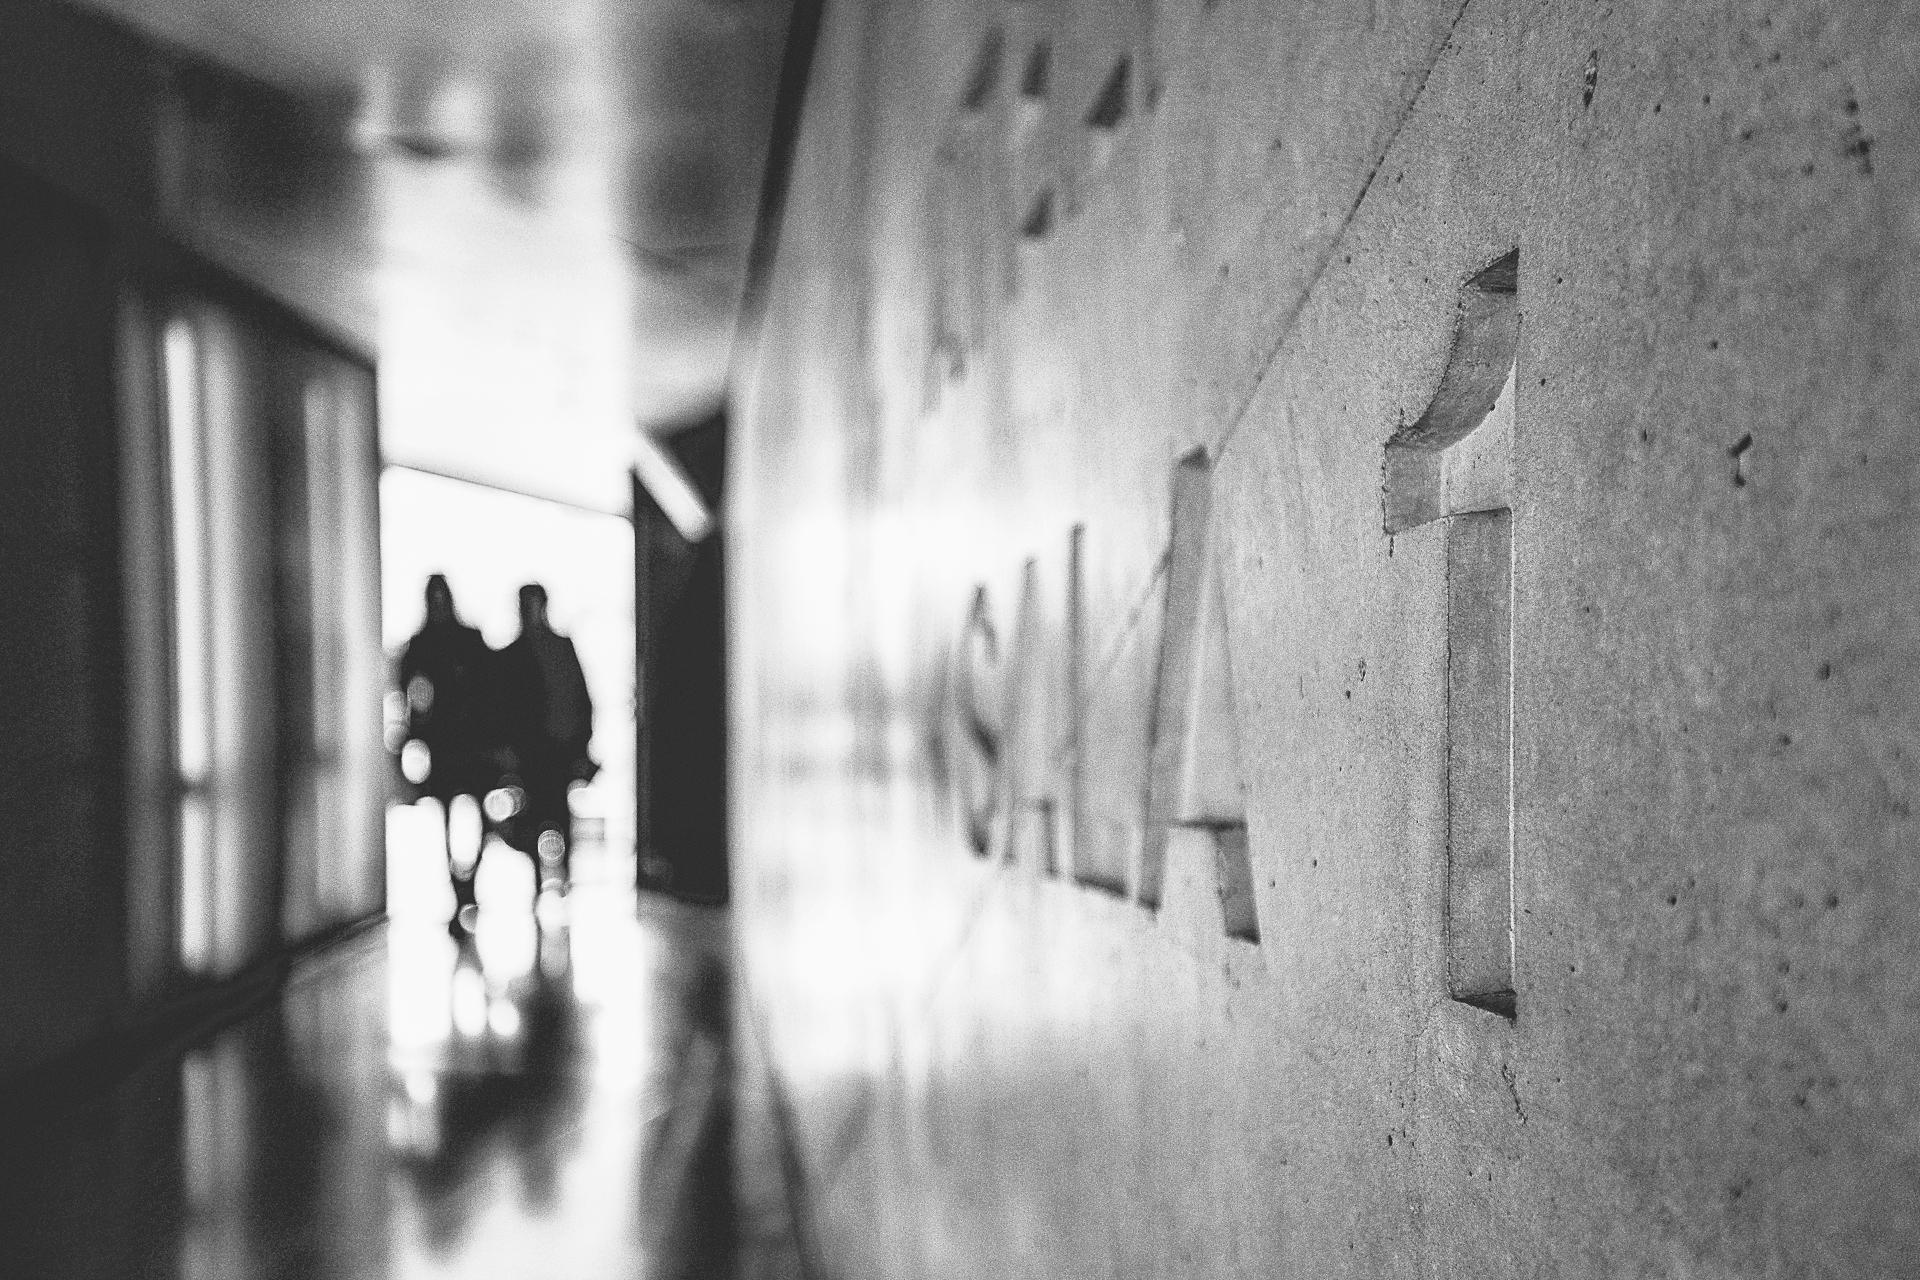 10-Aniversario-Casa-da-Musica-Porto-Reportagem-Fotografica-Photographic-Coverage-Fotografia-Photography-Arquitectura-Architecture-Rem-Koolhaas-bonjourmolotov-18N6.jpg